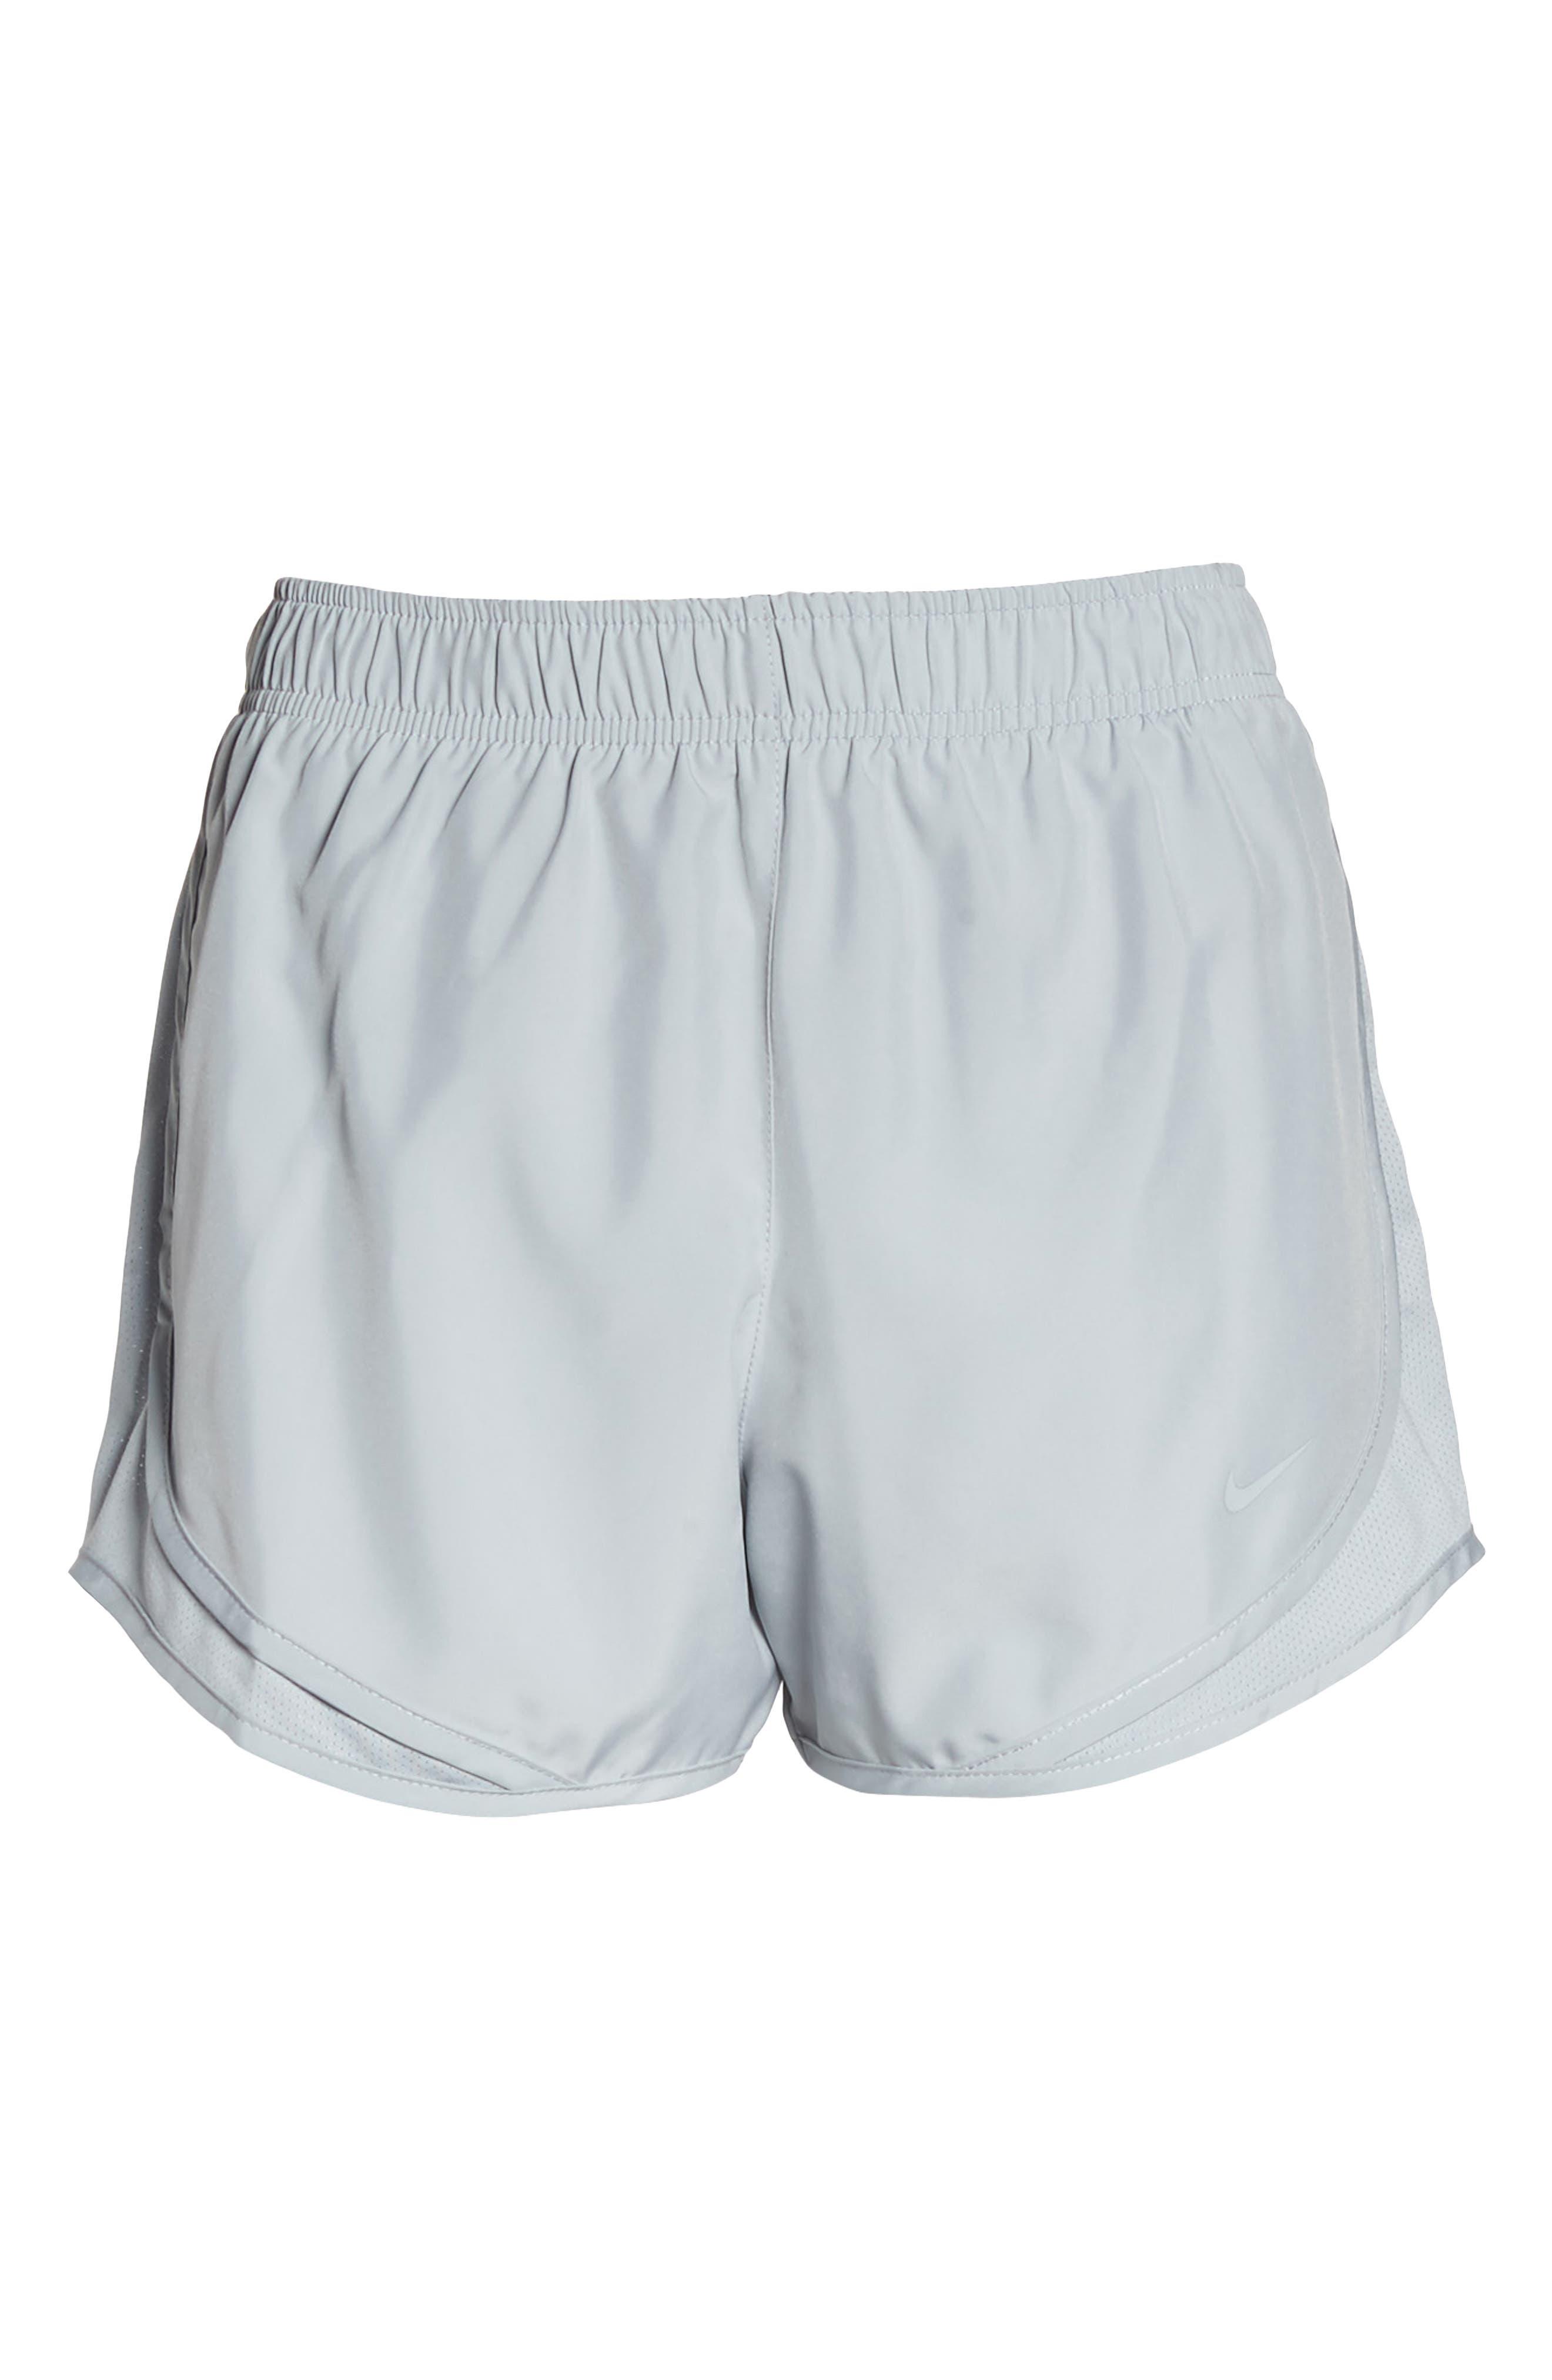 Nike Dry Tempo Running Shorts